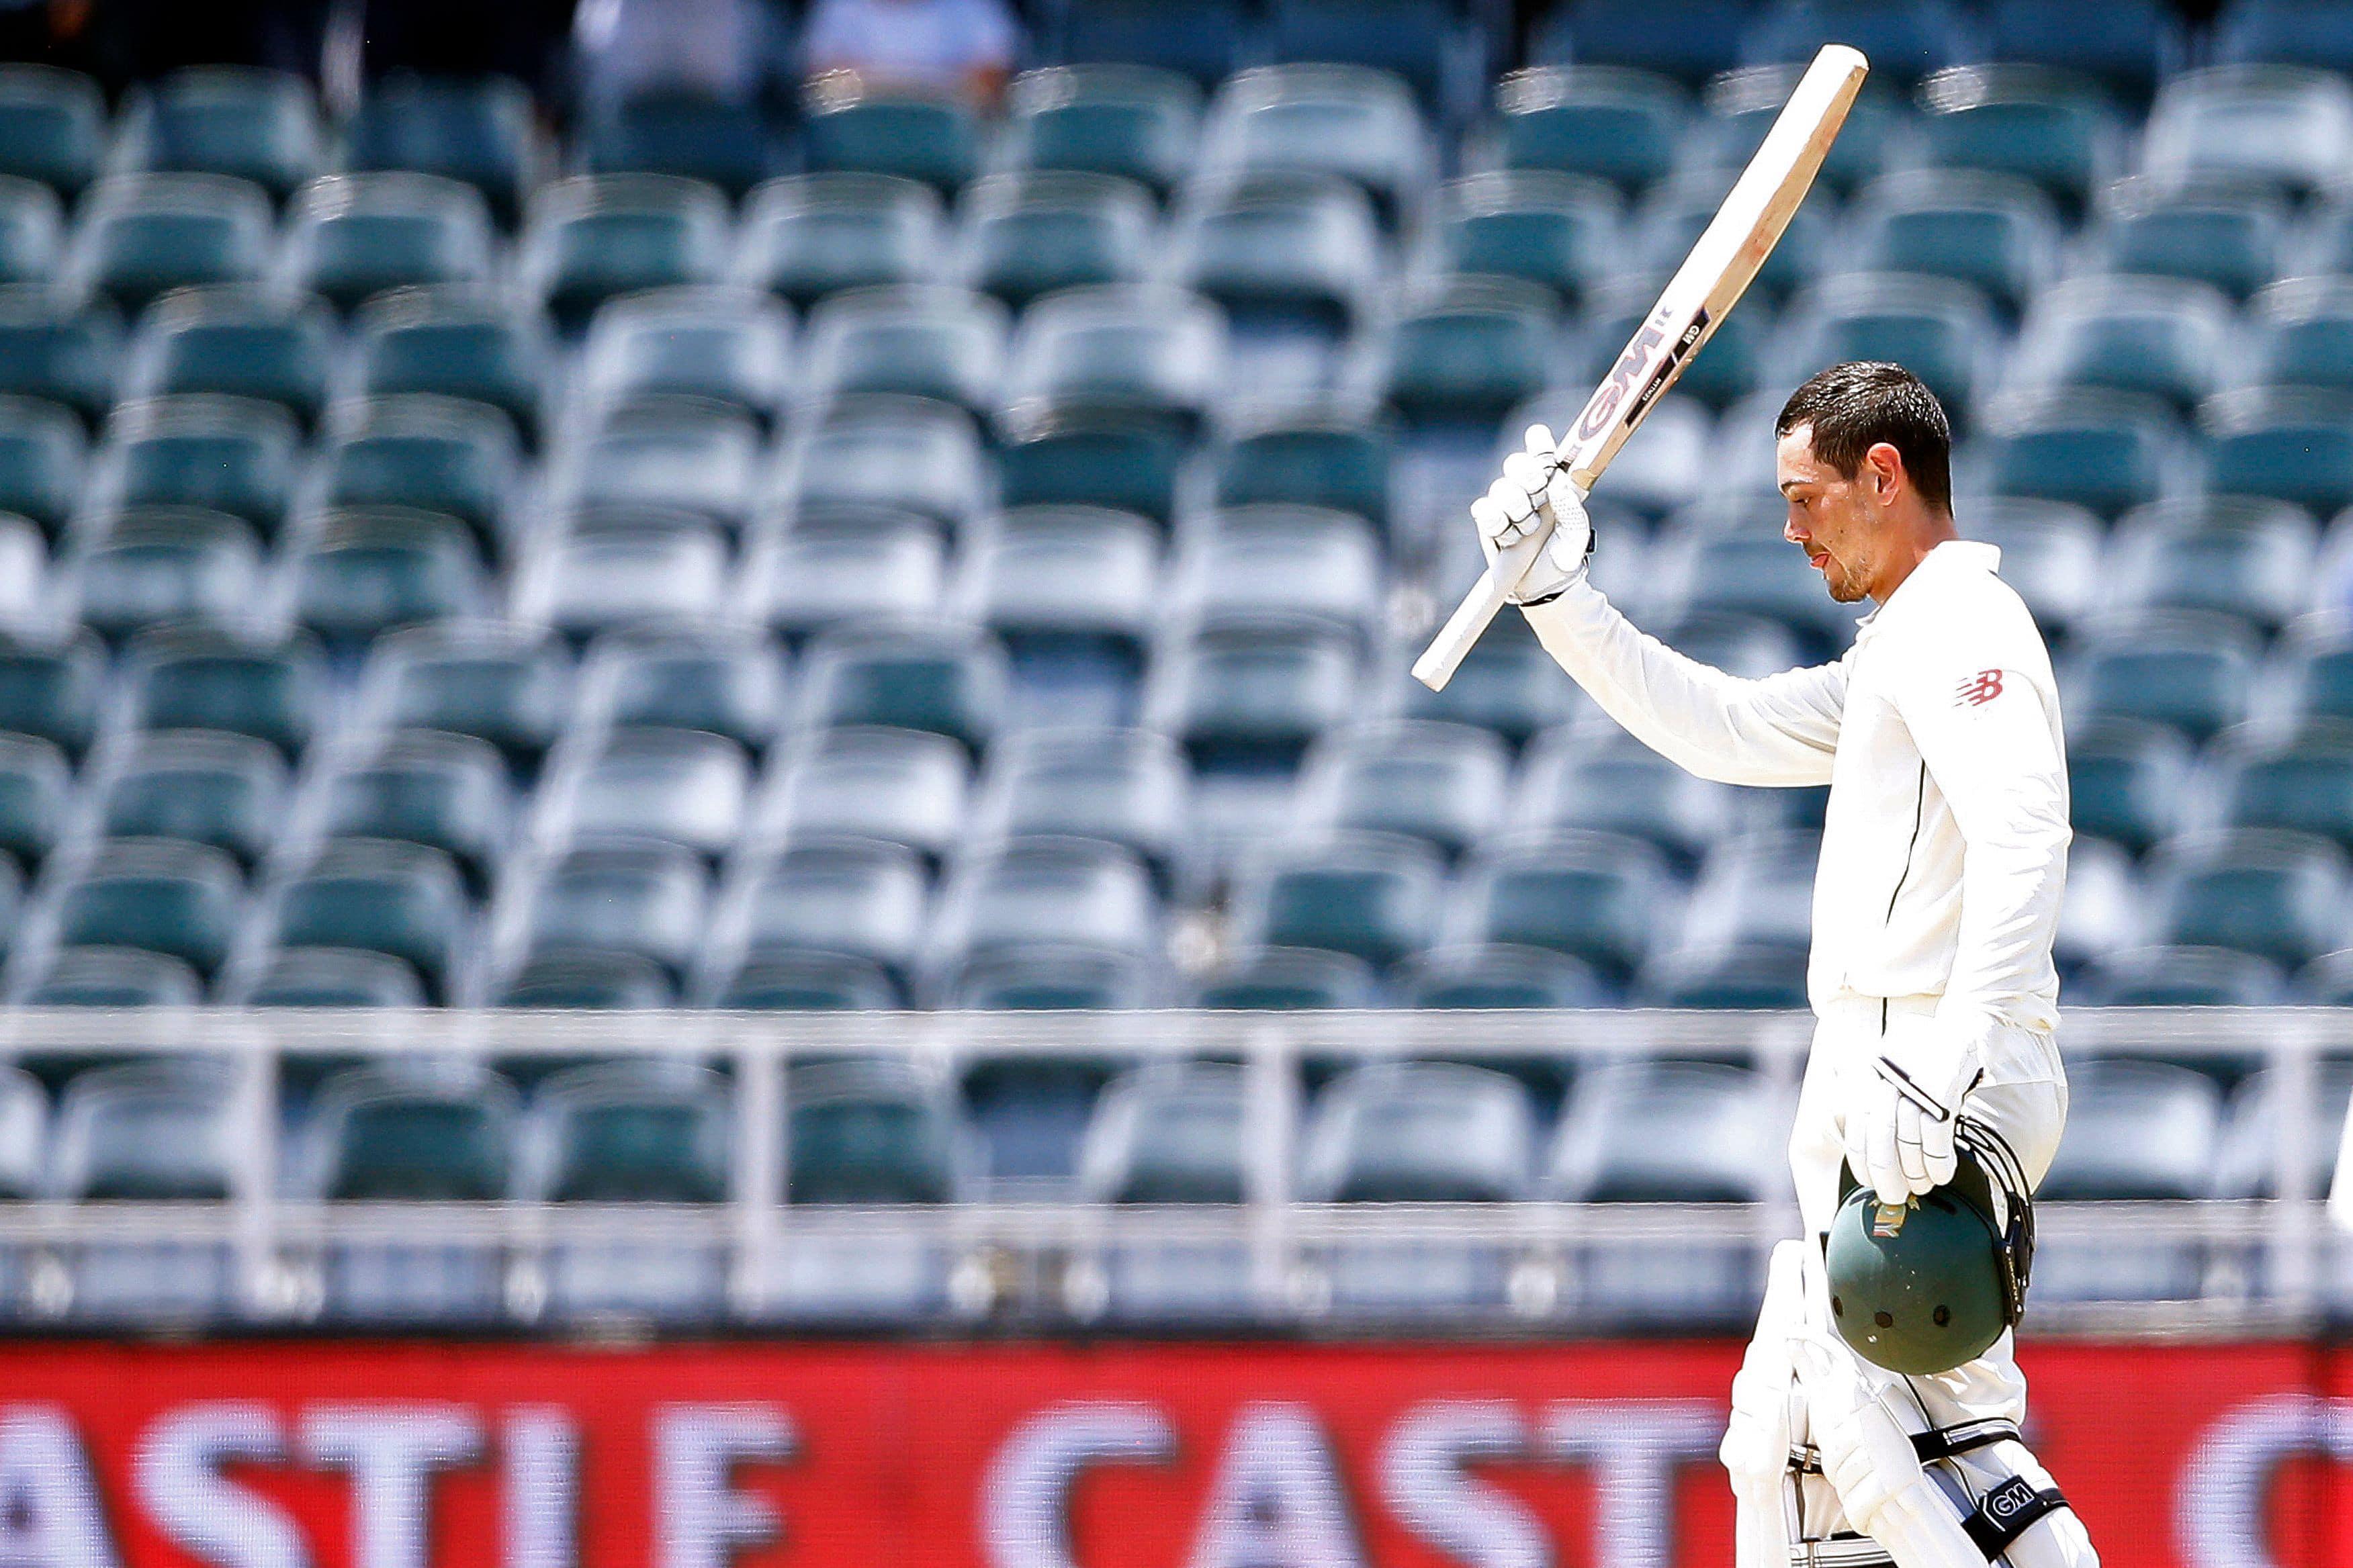 South Africa vs Pakistan - Third Test in Johannesburg